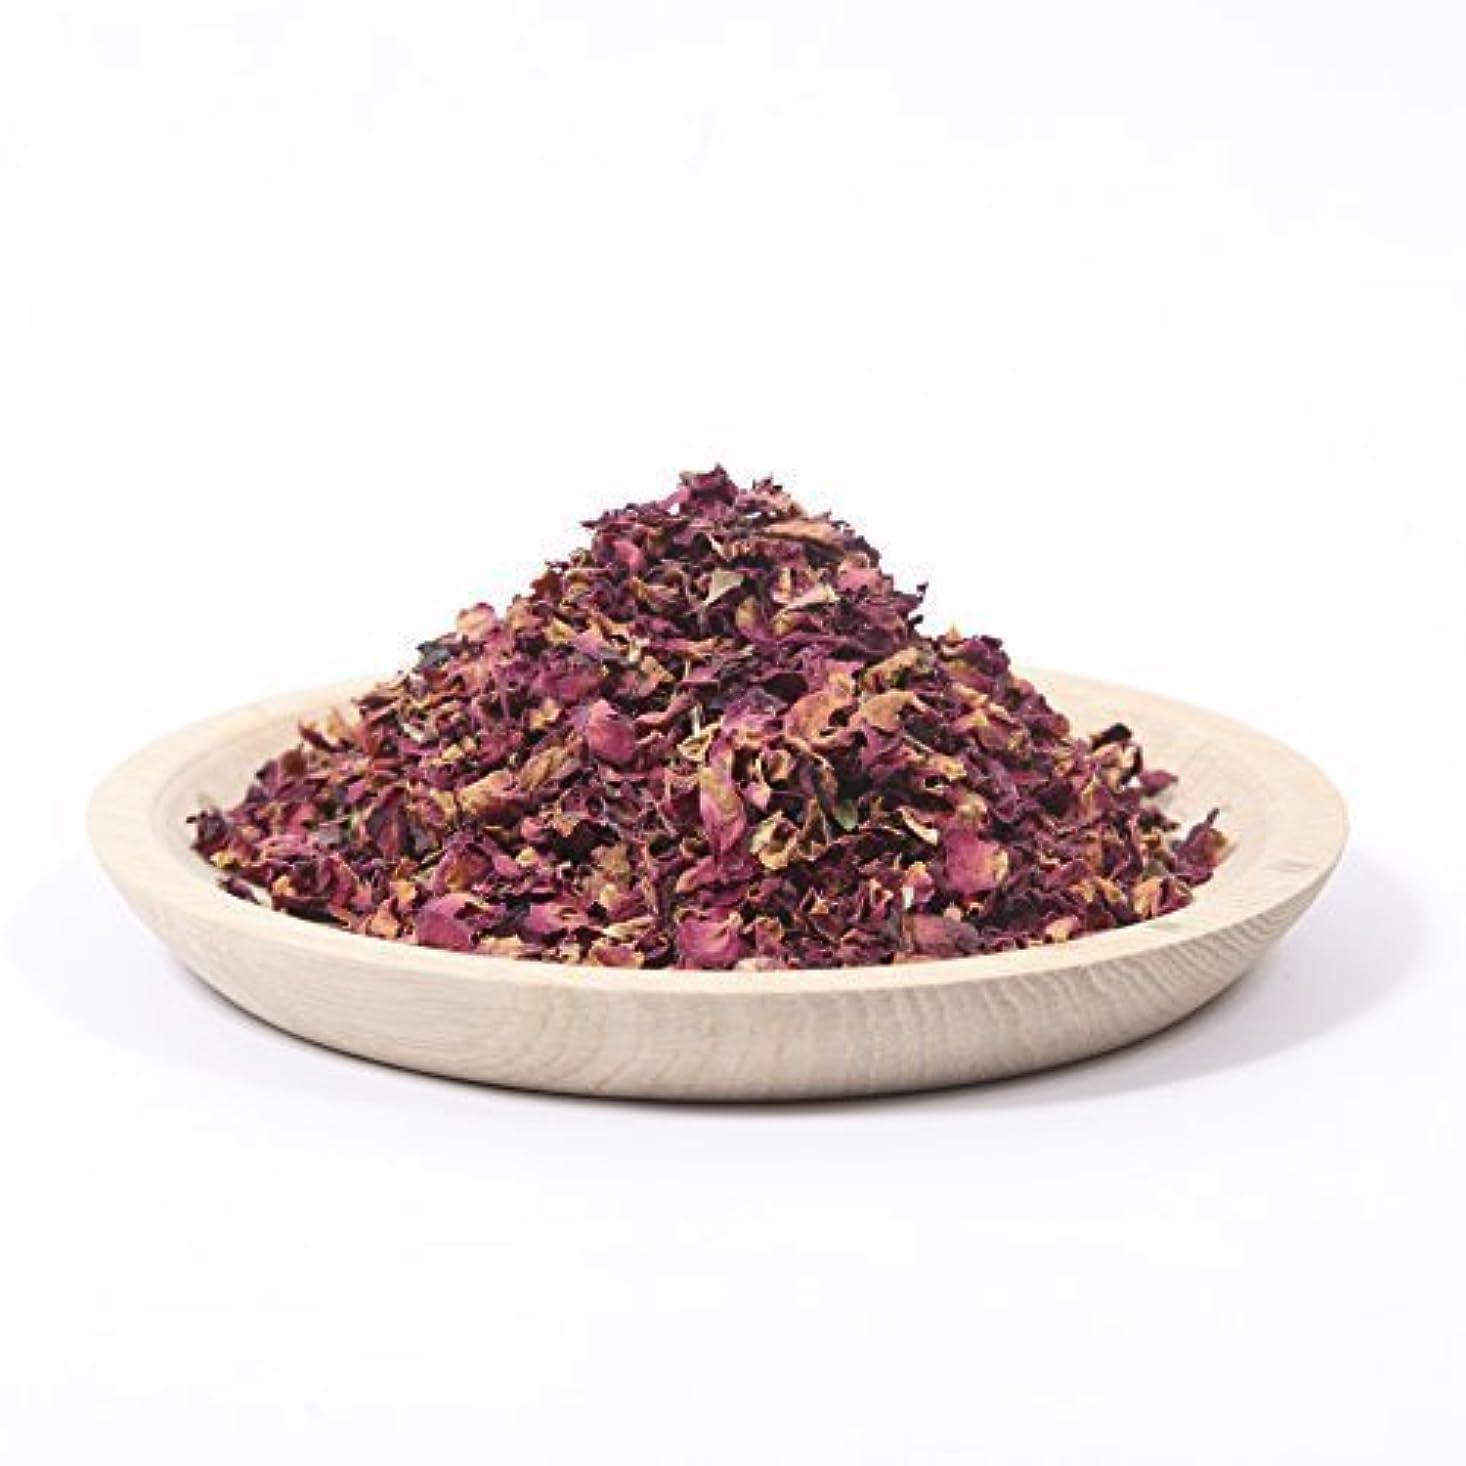 複製責不承認Dried Rose Petals - 500g